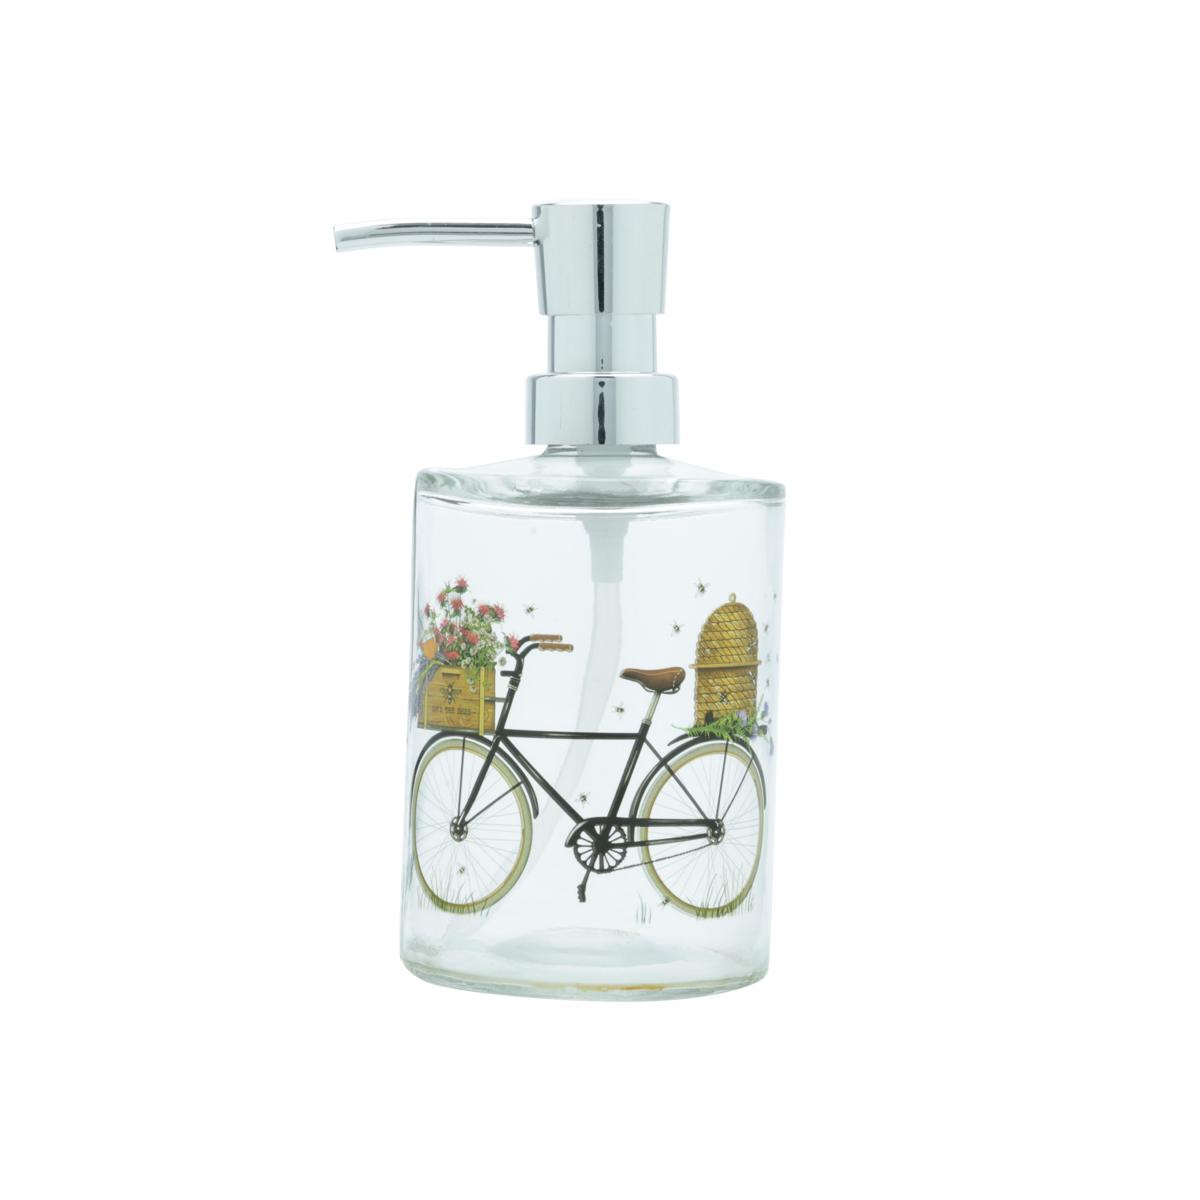 Porta sabonete líquido vidro Bike and Flower preto Urban